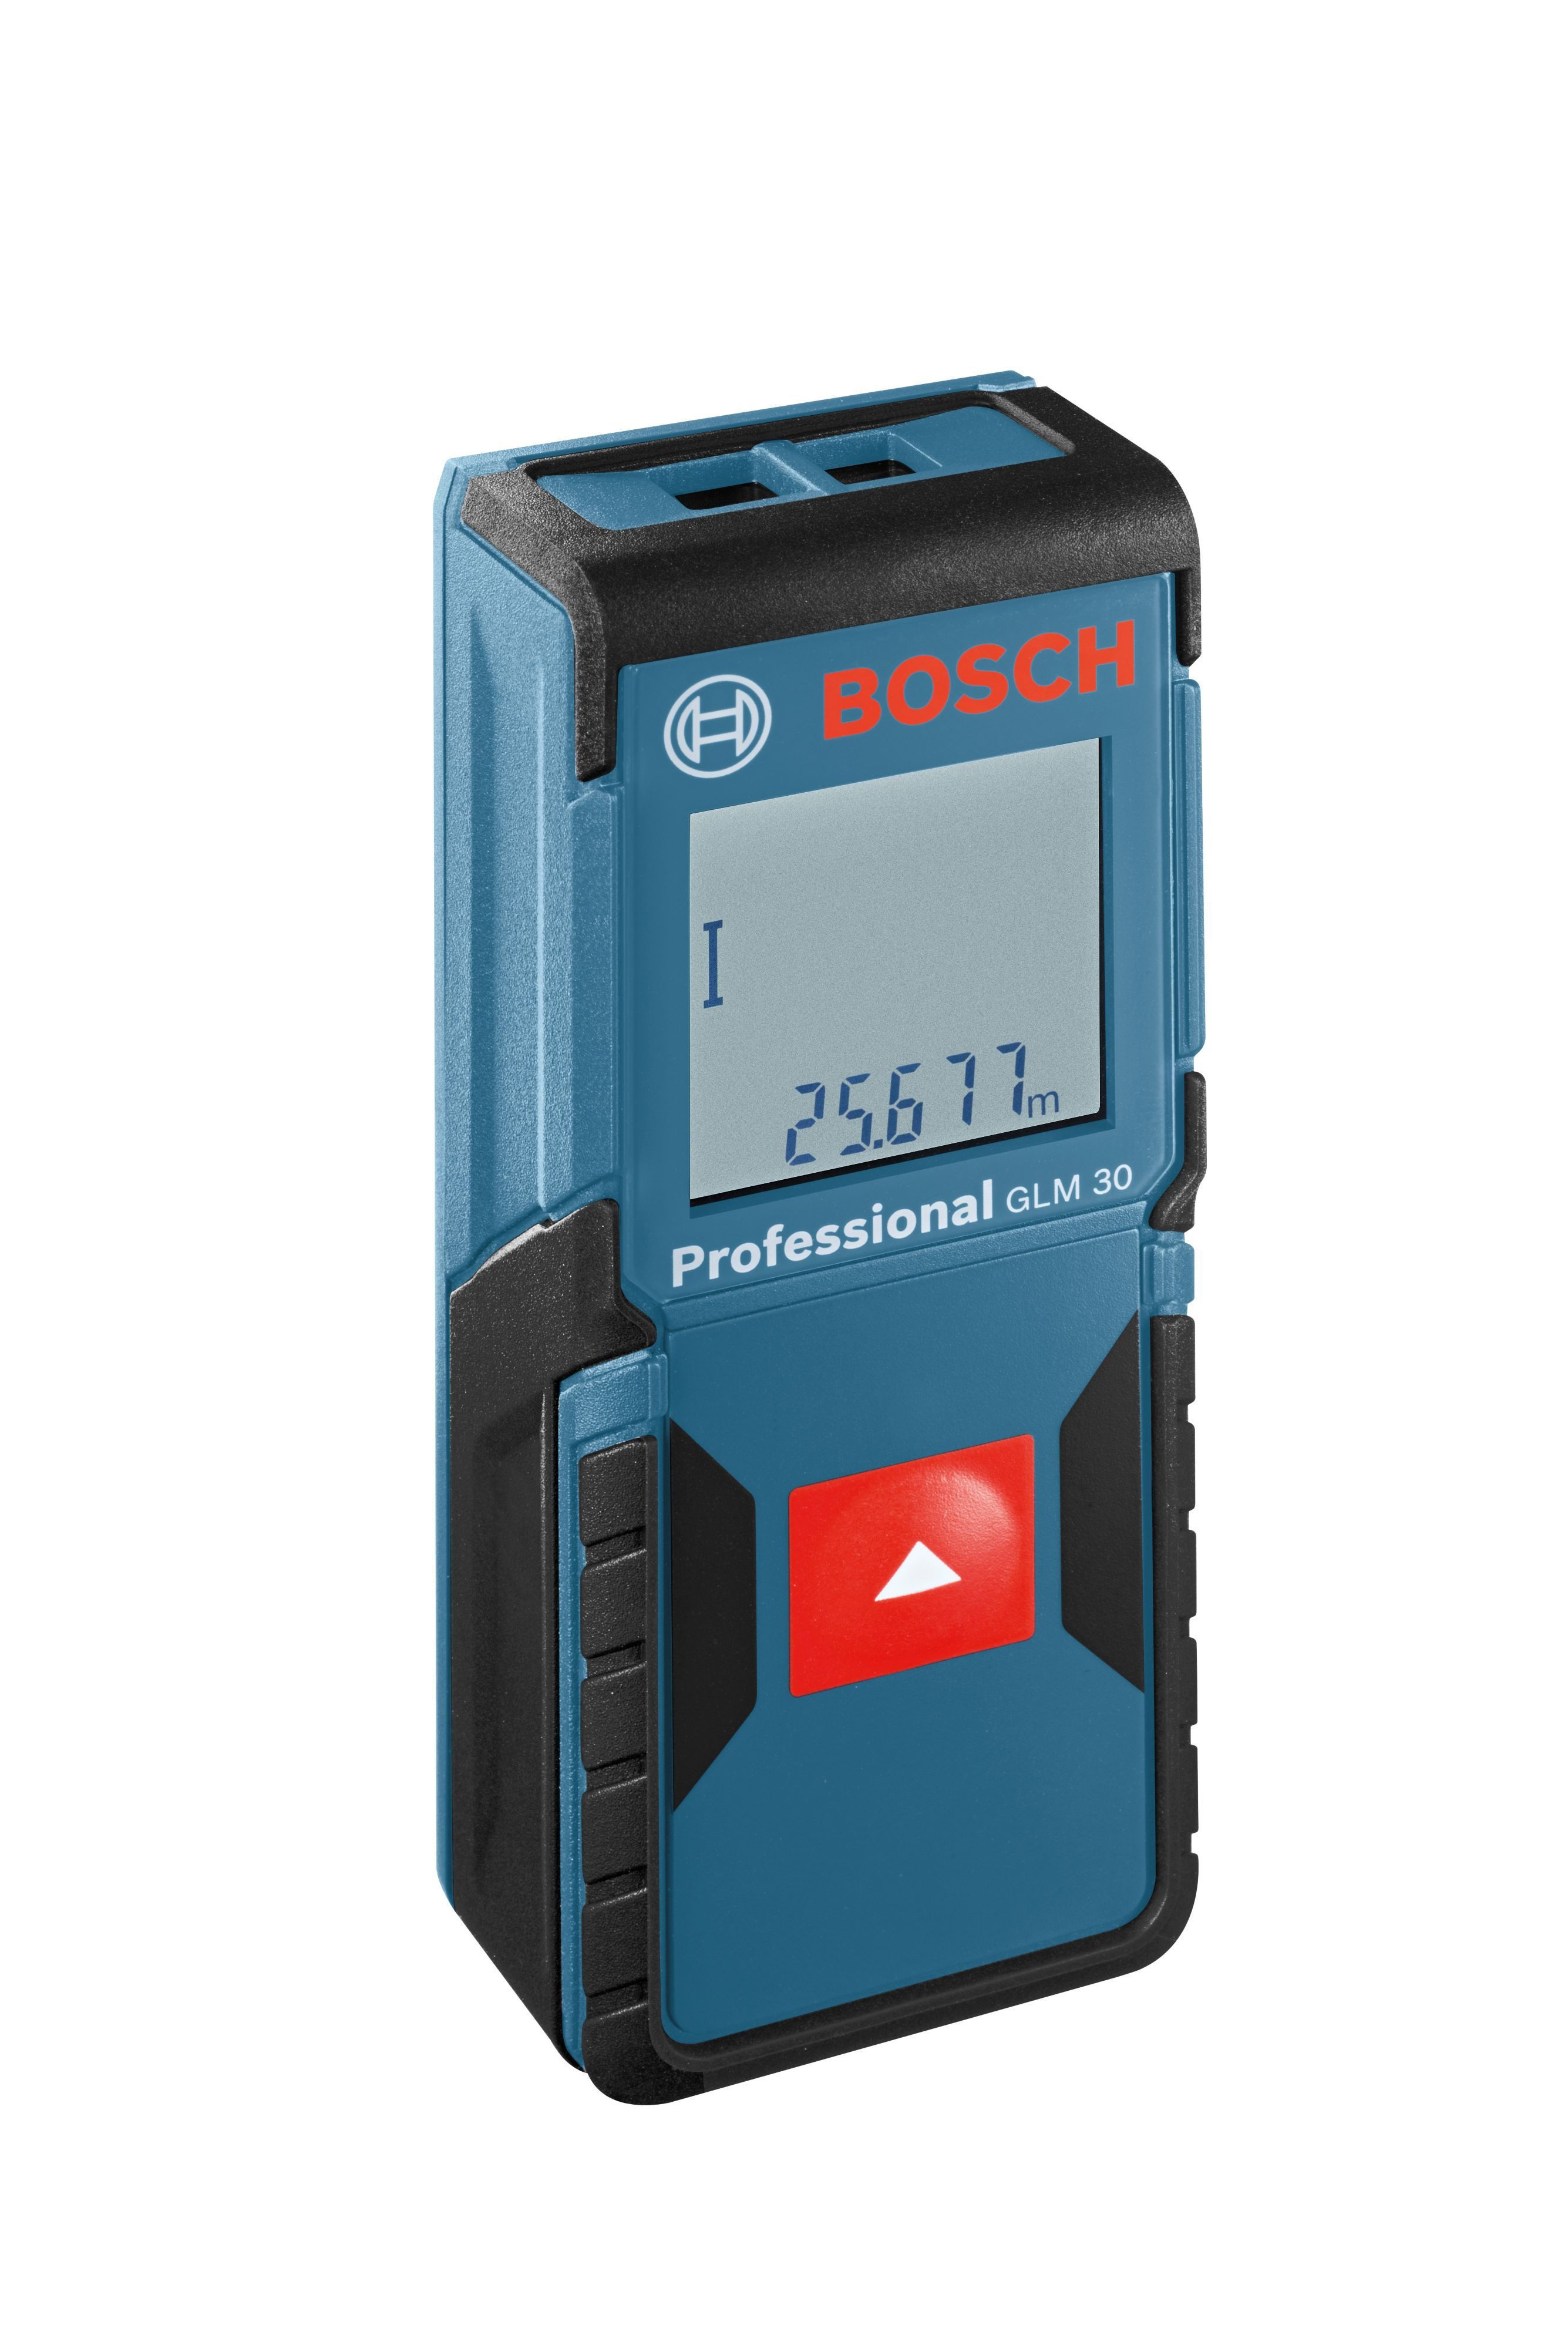 Bosch Professional 30m Laser measure | Departments | DIY at B&Q